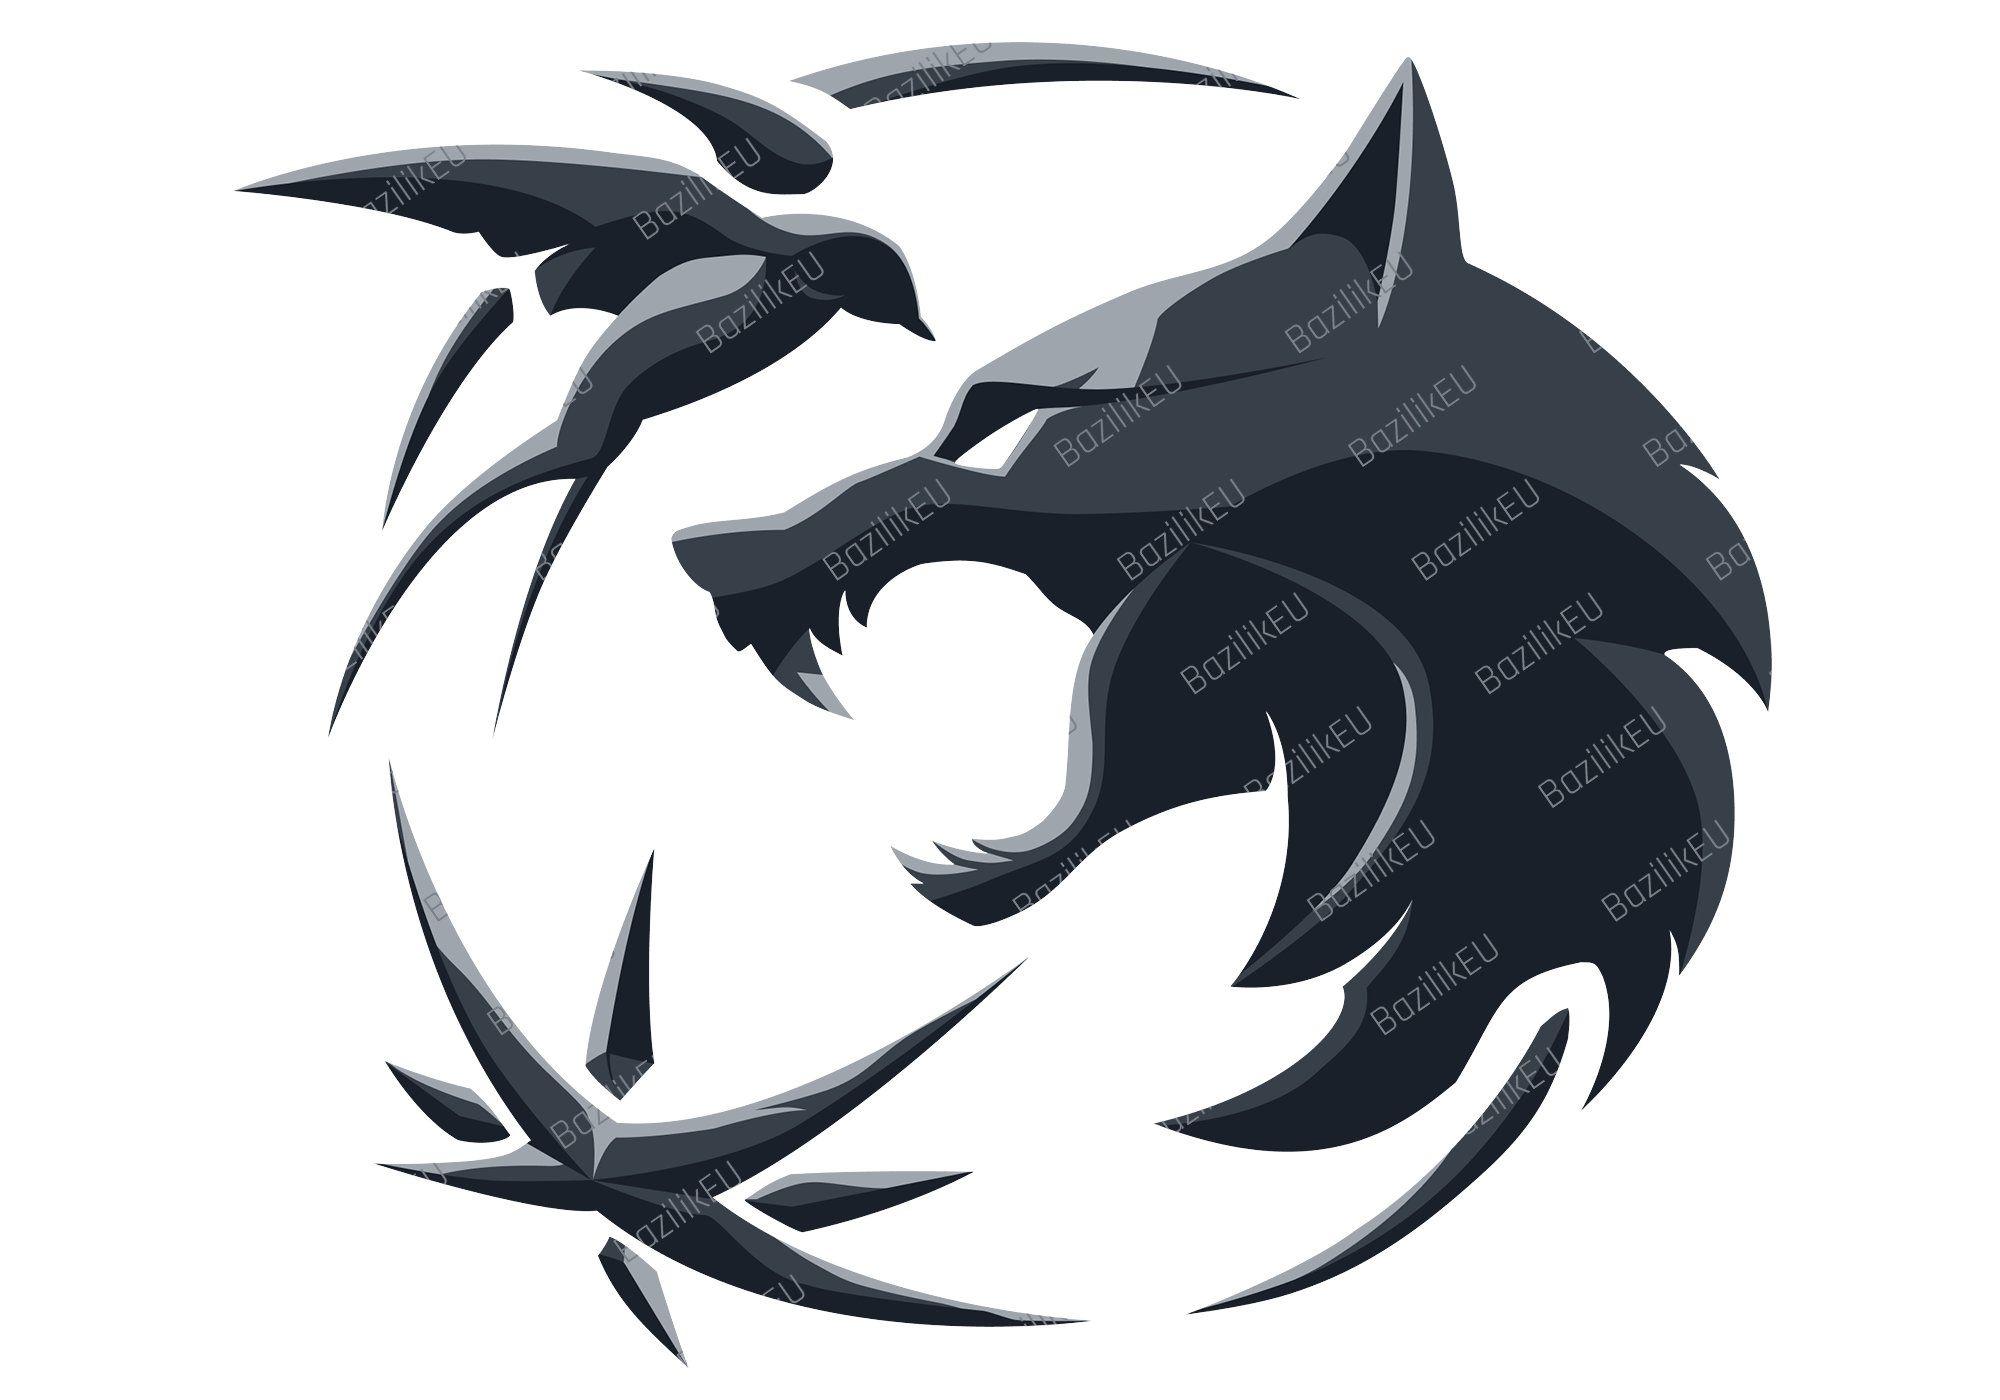 Wolf Witcher Medallion Svg Digital Download Instant The Witcher Svg Cricut Witcher 3 Art In 2021 Witcher Medallion Witcher Tattoo The Witcher